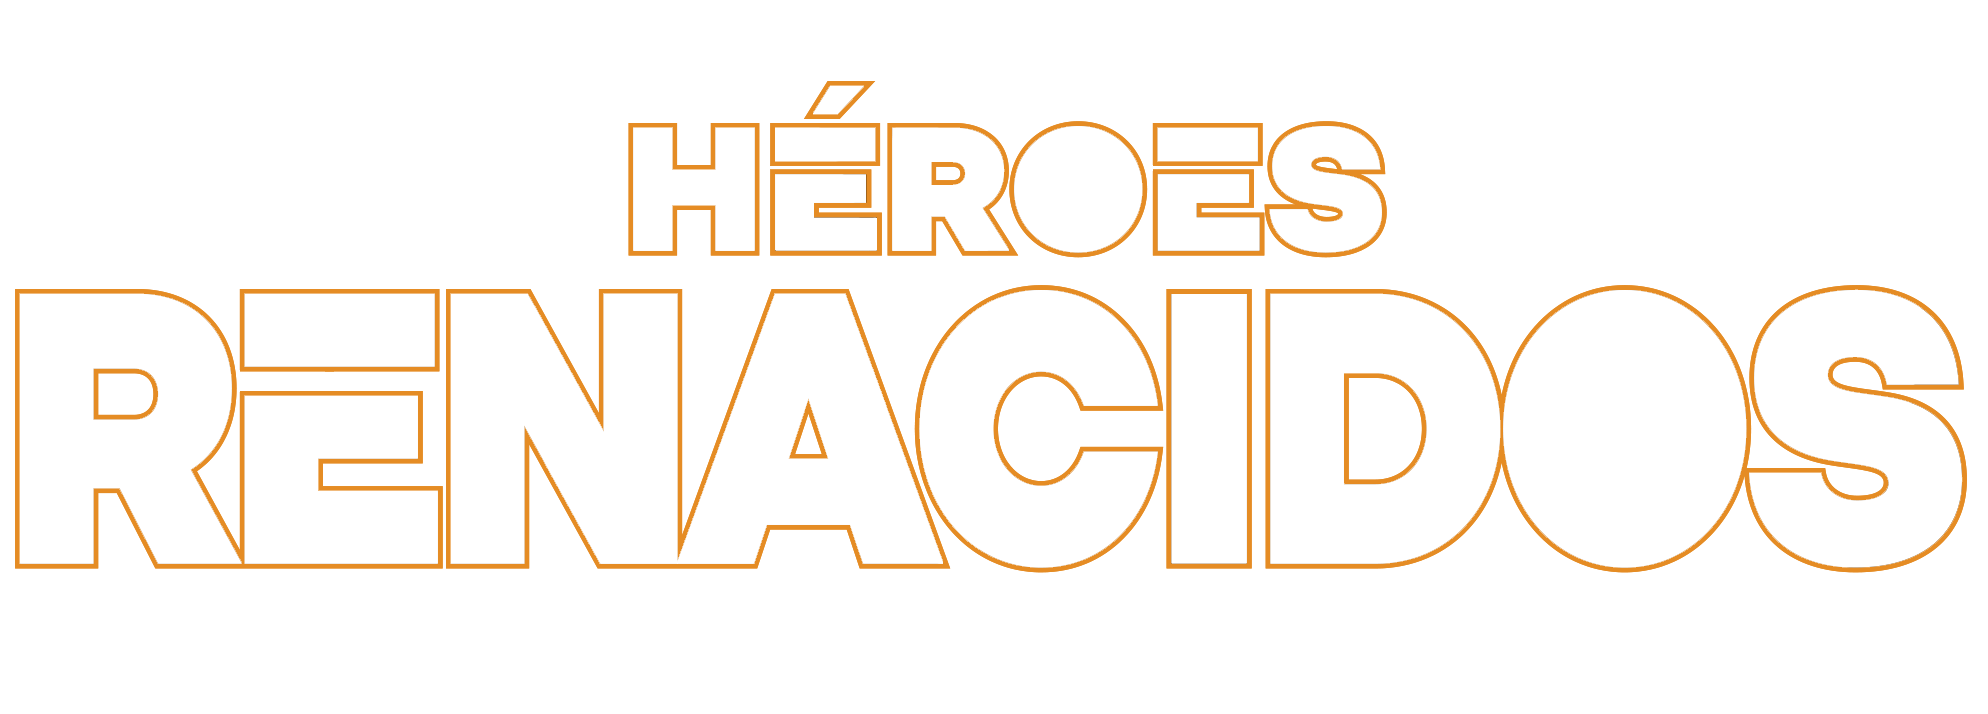 heroesreborn5.png